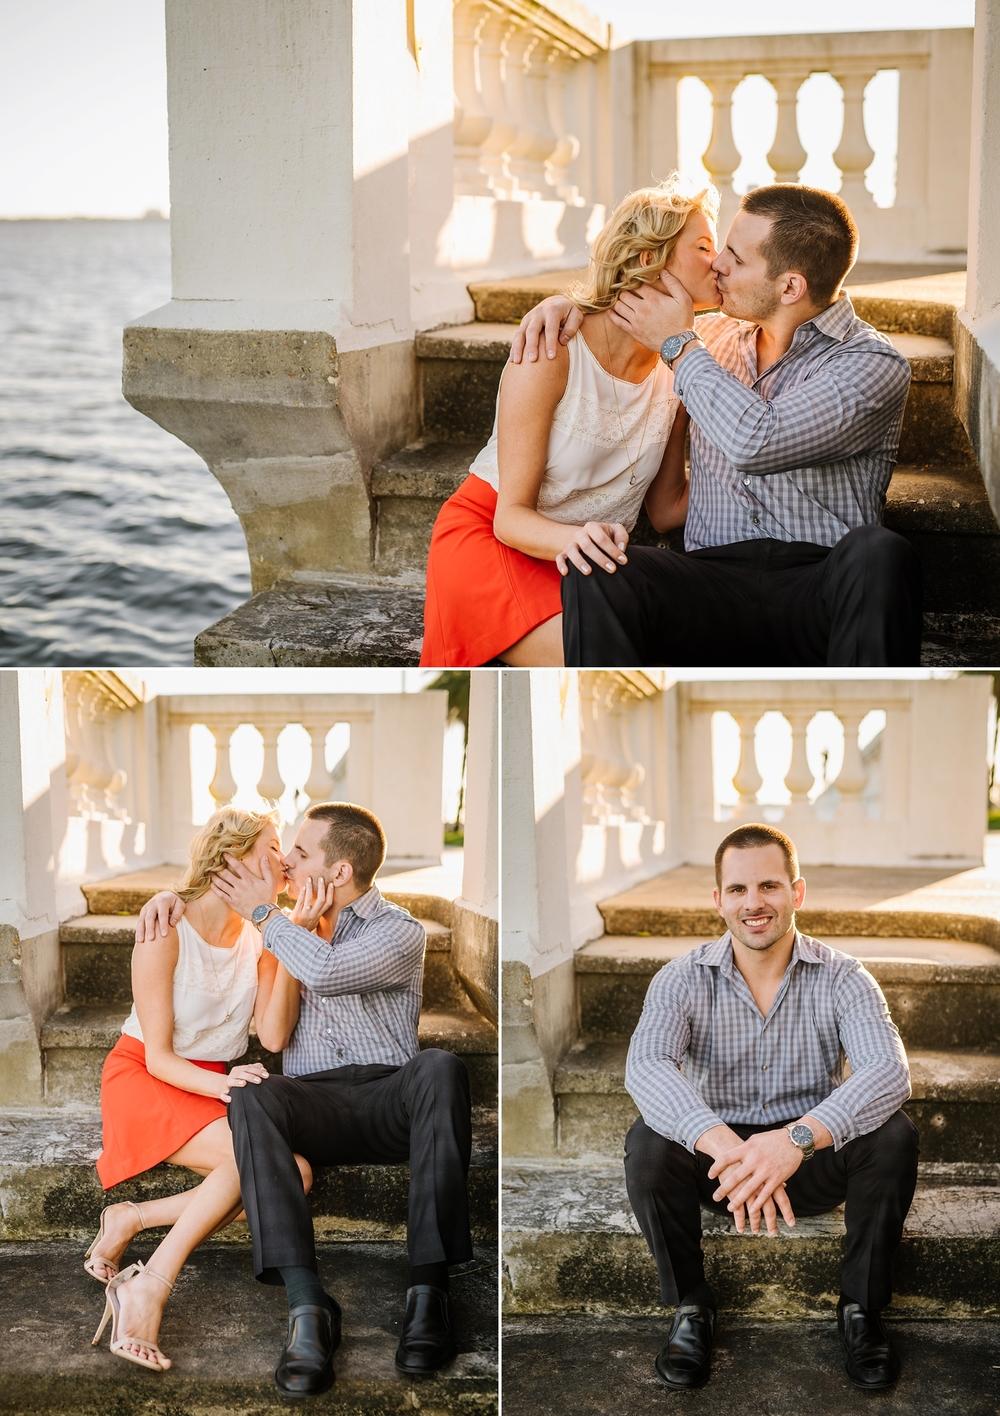 romantic-waterfront-engagement-photography-ashlee-hamon_0007.jpg